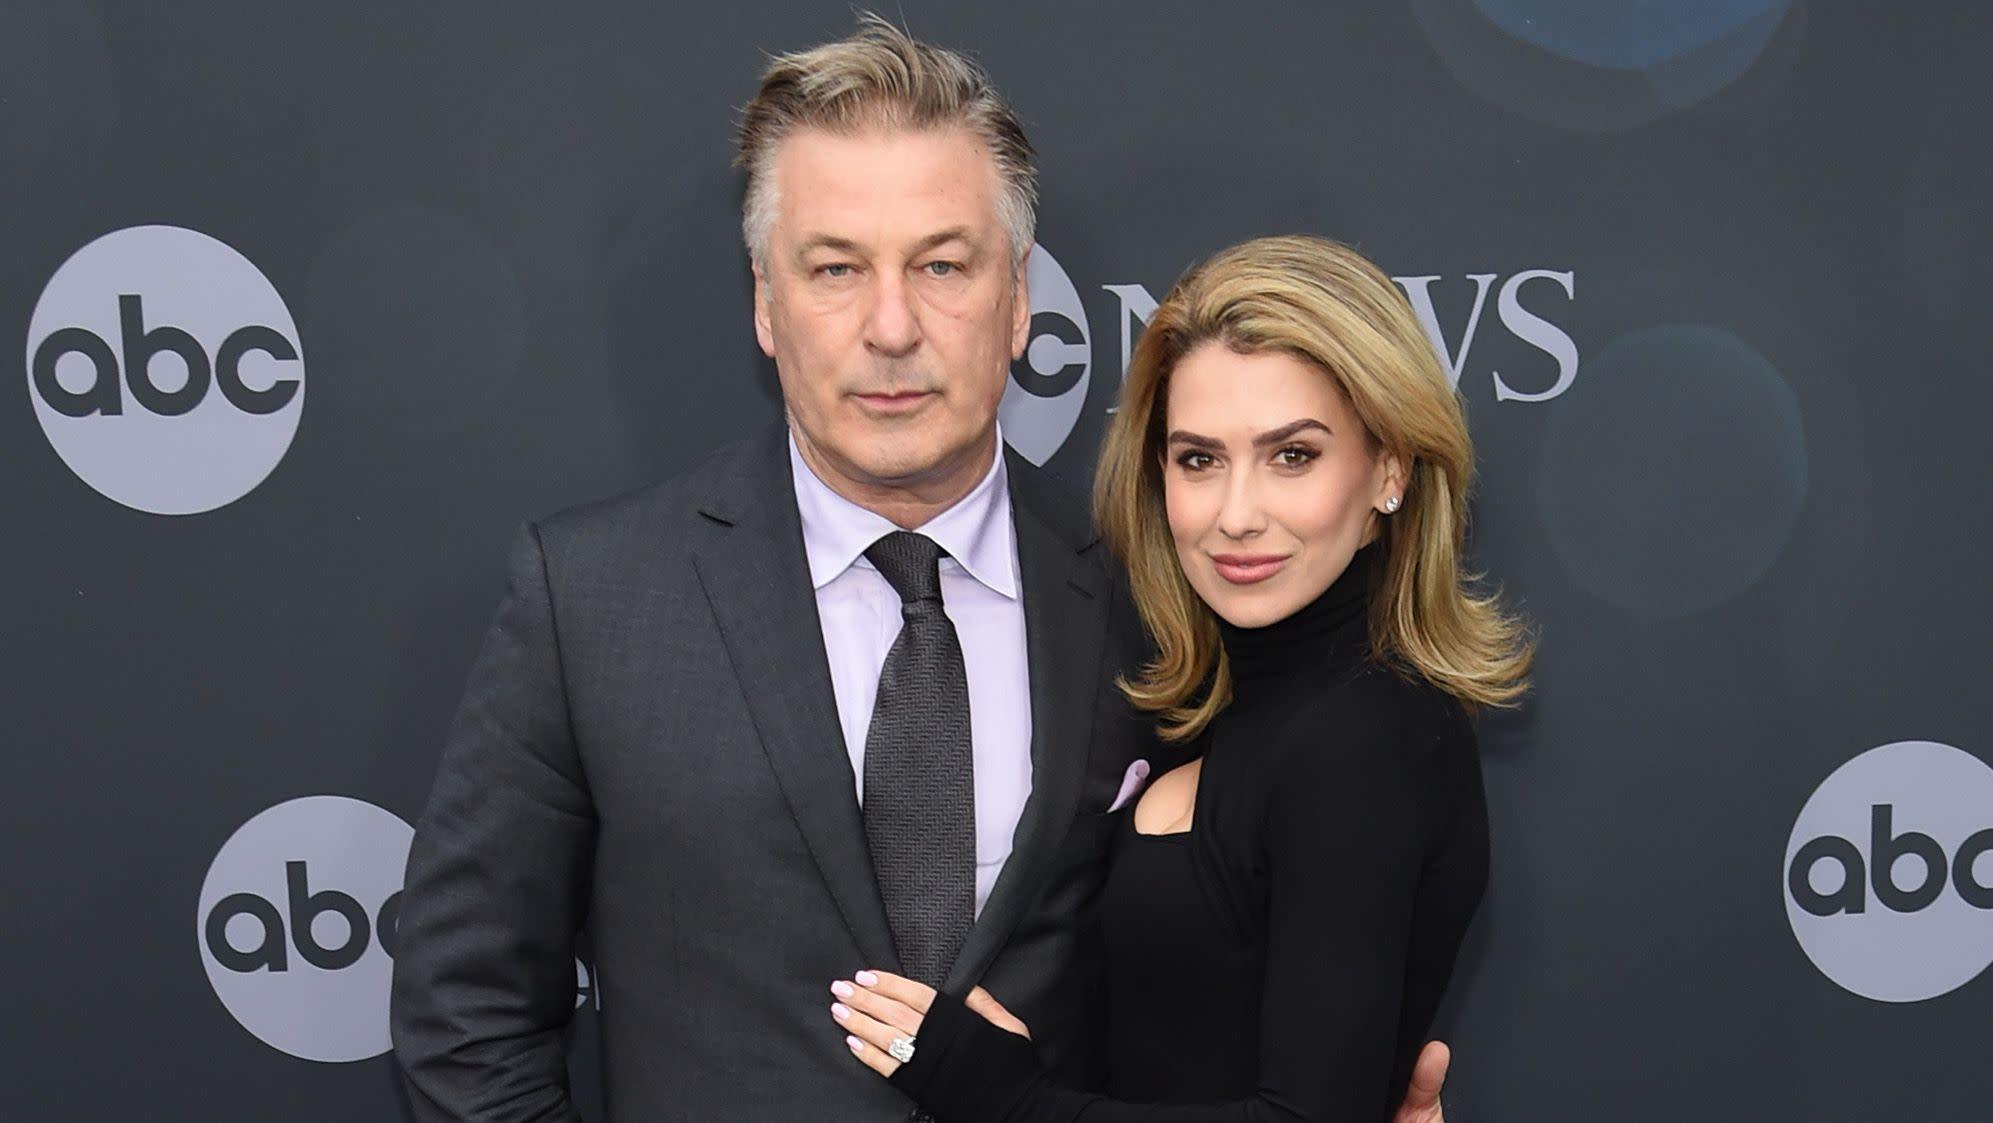 Alec Baldwin and his pregnant wife Hilaria Baldwin attend